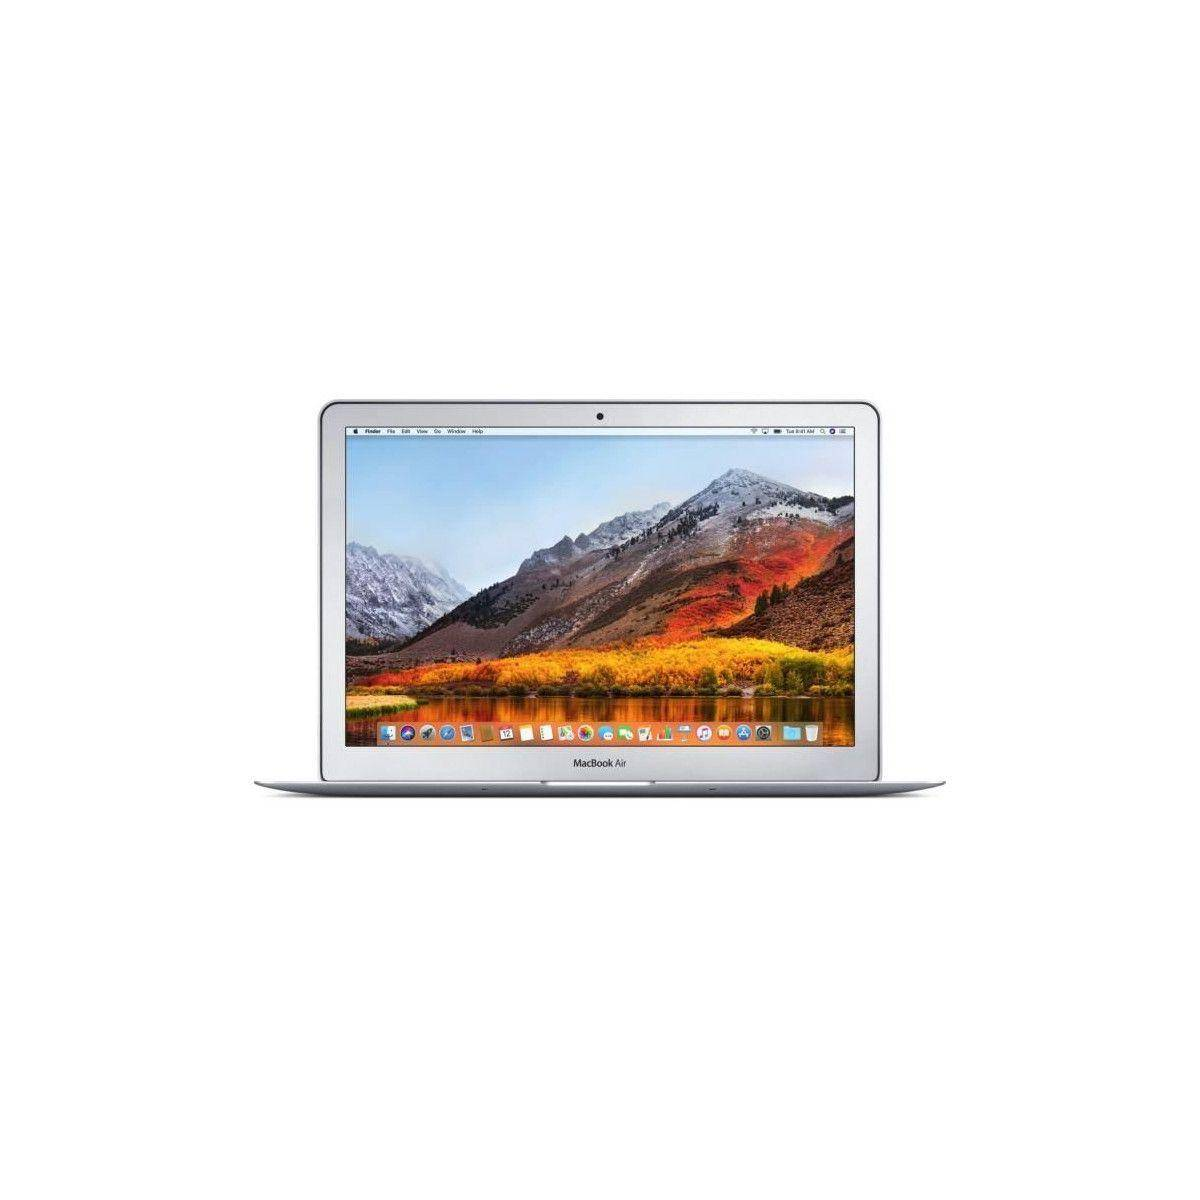 APPLE MacBook Air MQD42FN/A - 13,3 pouces - Intel Core i5 - RAM 8Go - Stockage 256Go SSD